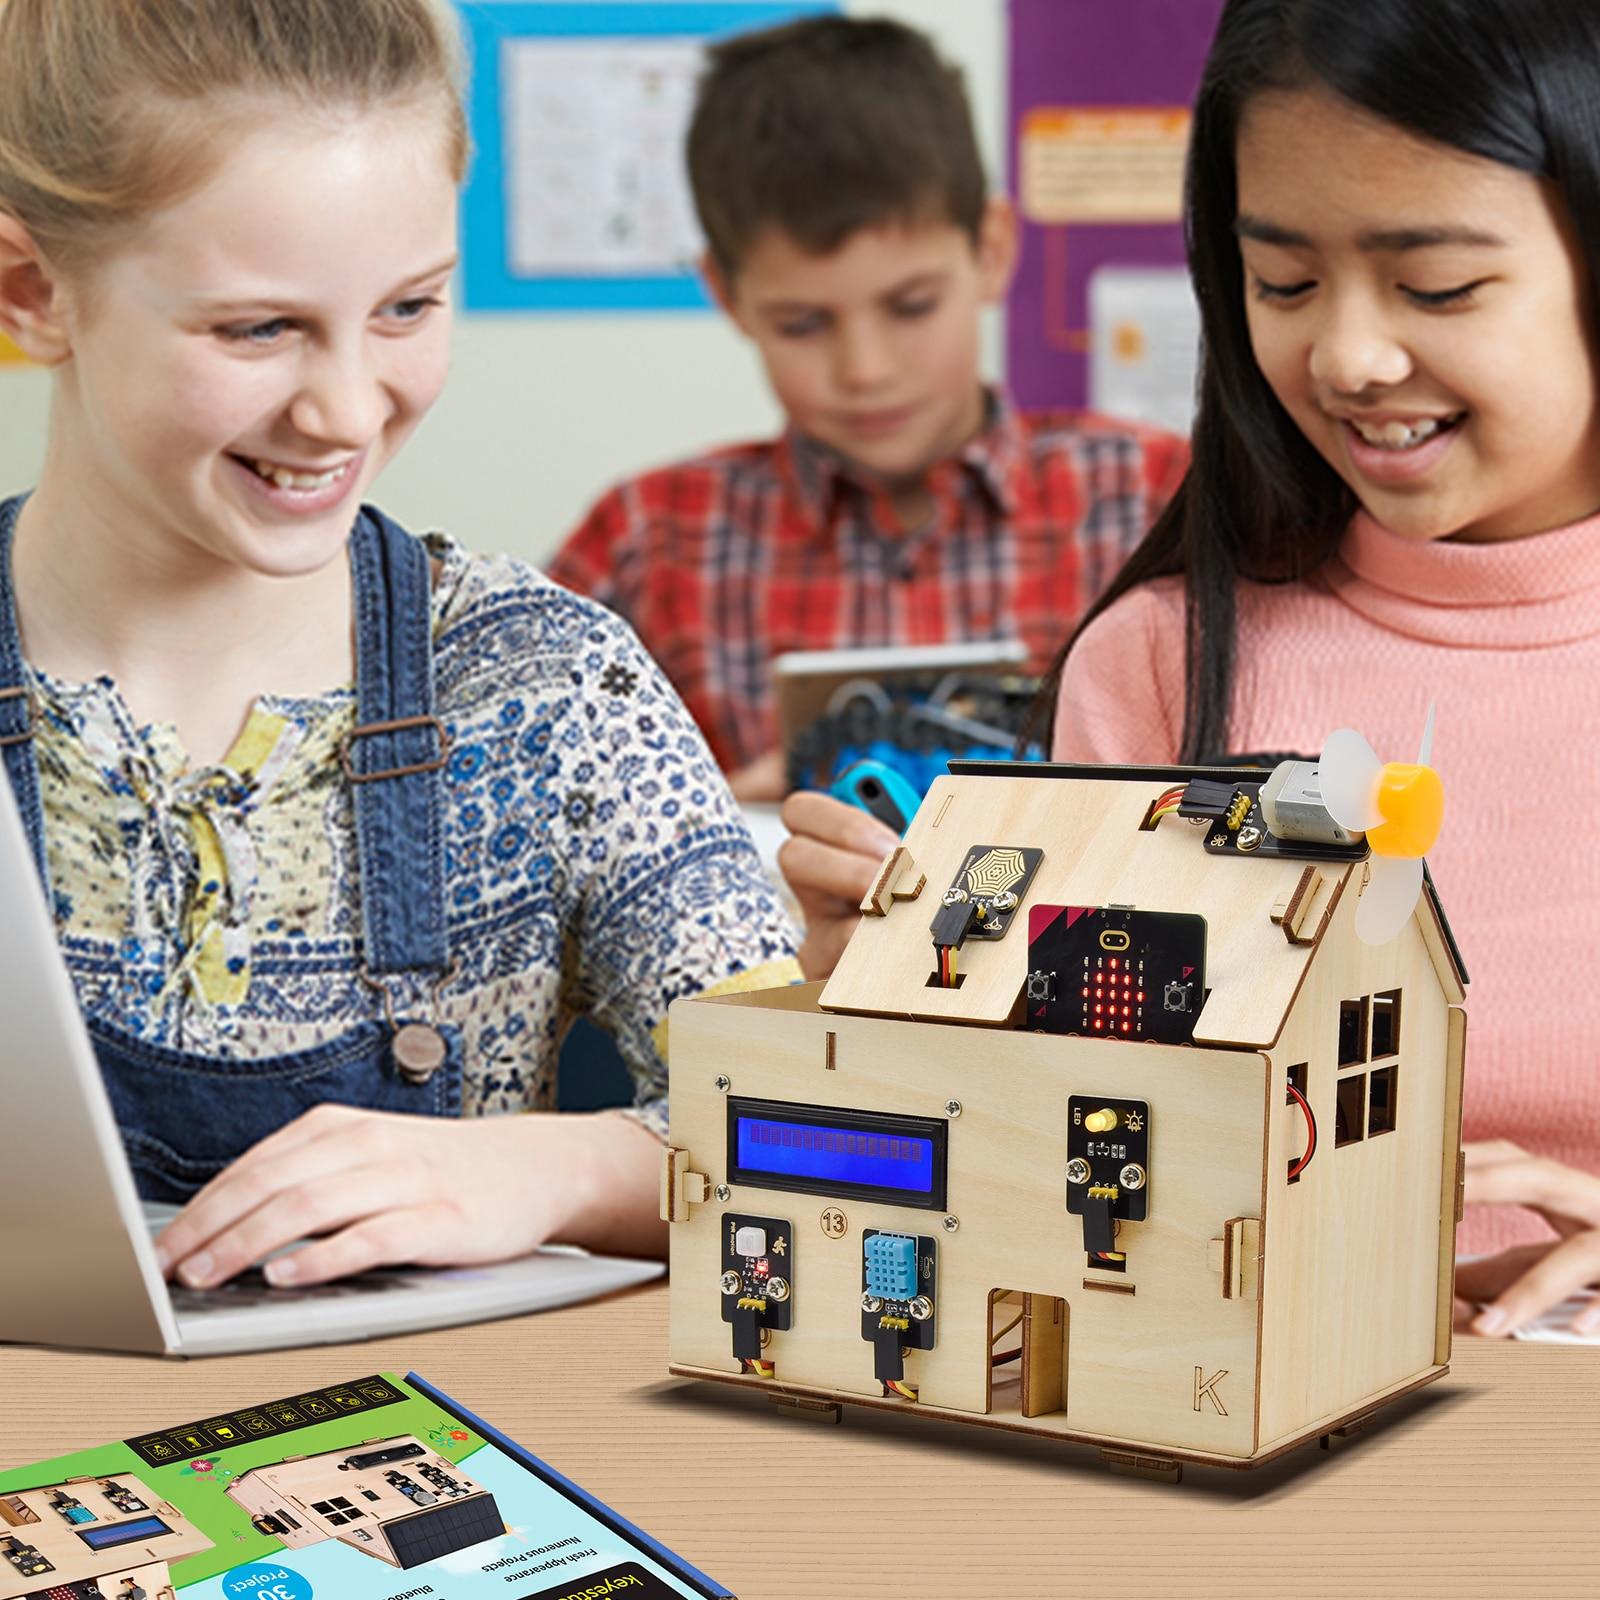 New ! Keyestudio Smart Home Kit for BBC Micro:Bit Kit Starter Kit DIY STEM With Solar Panels ( NO Micro:Bit Board )